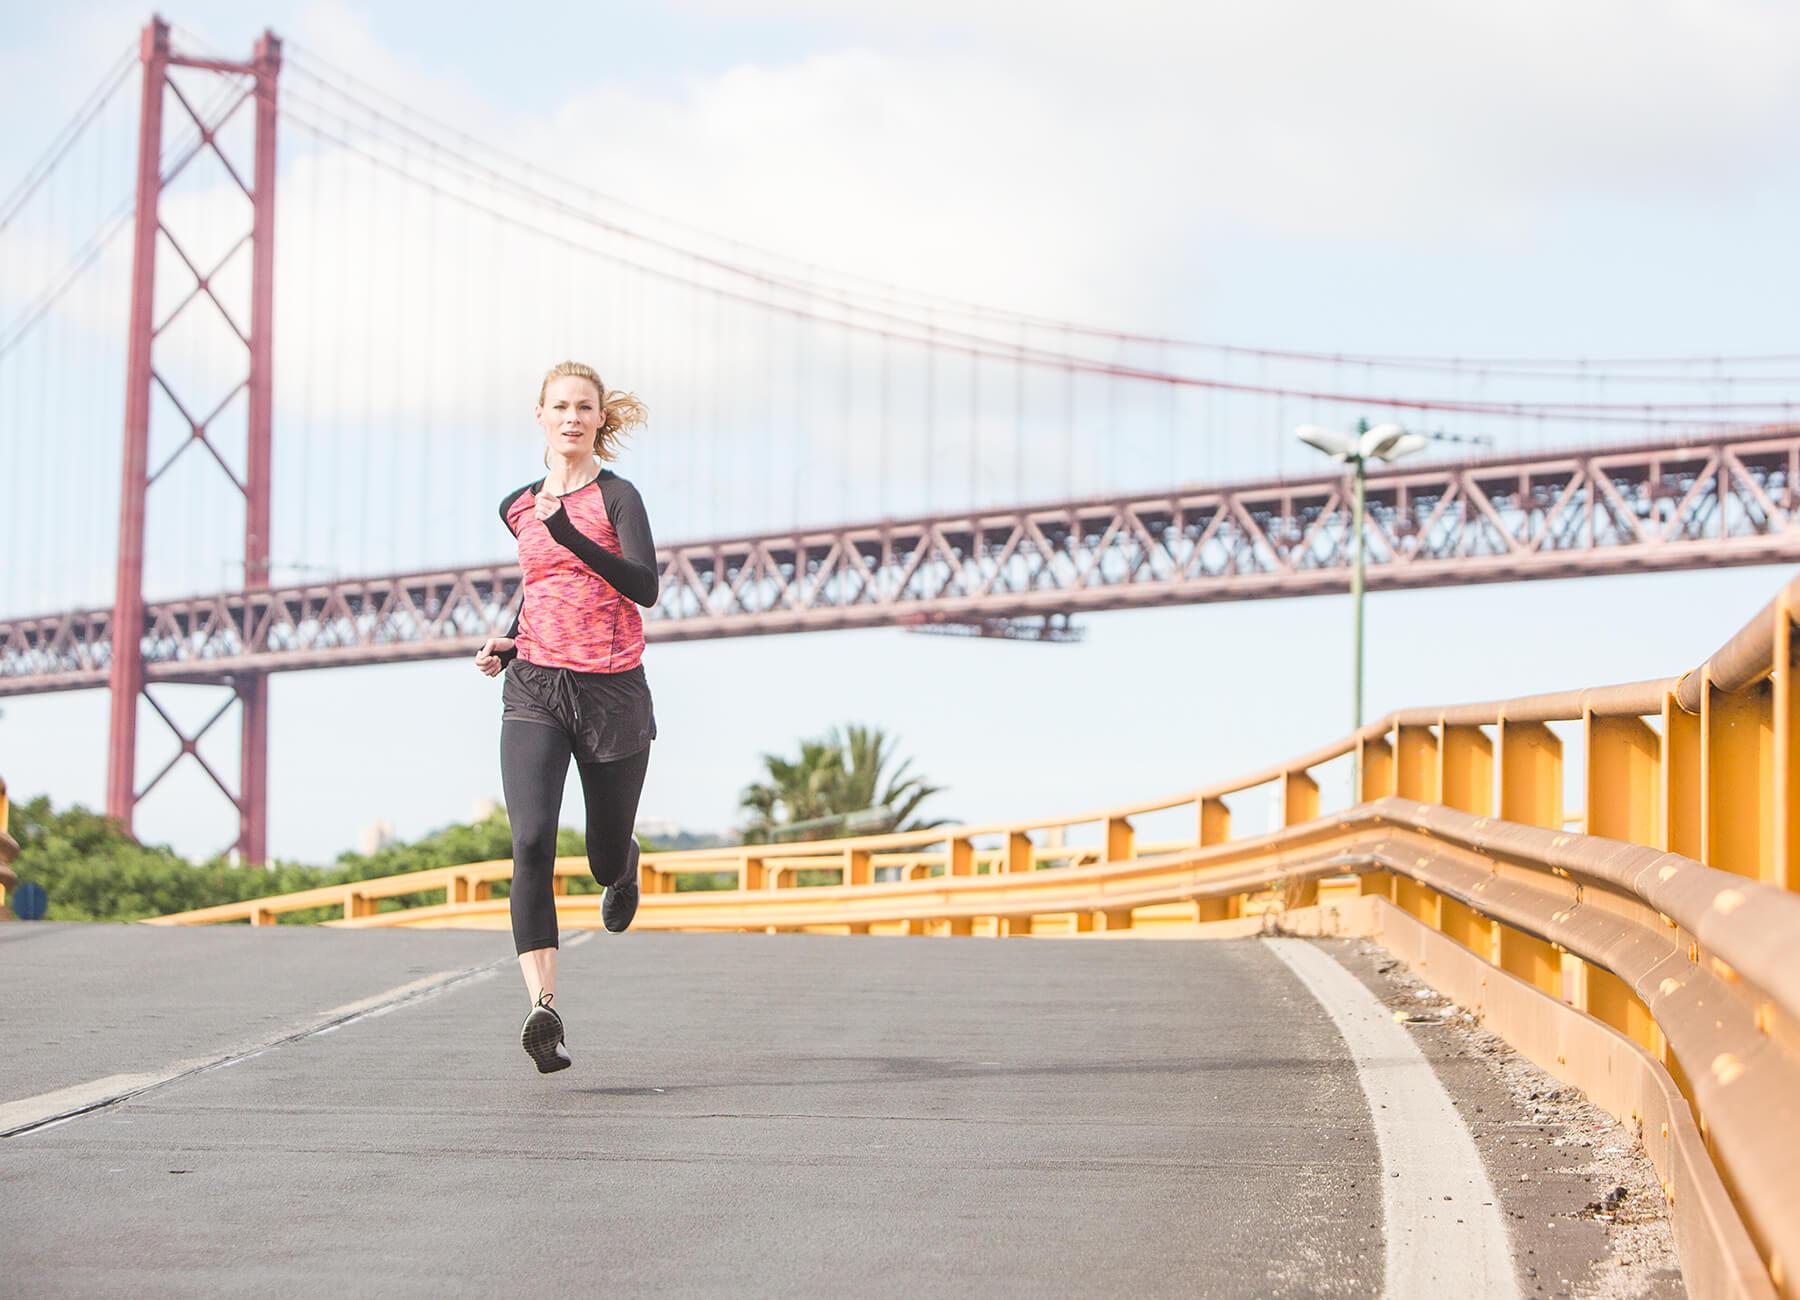 Lisboa_Running_Bridge